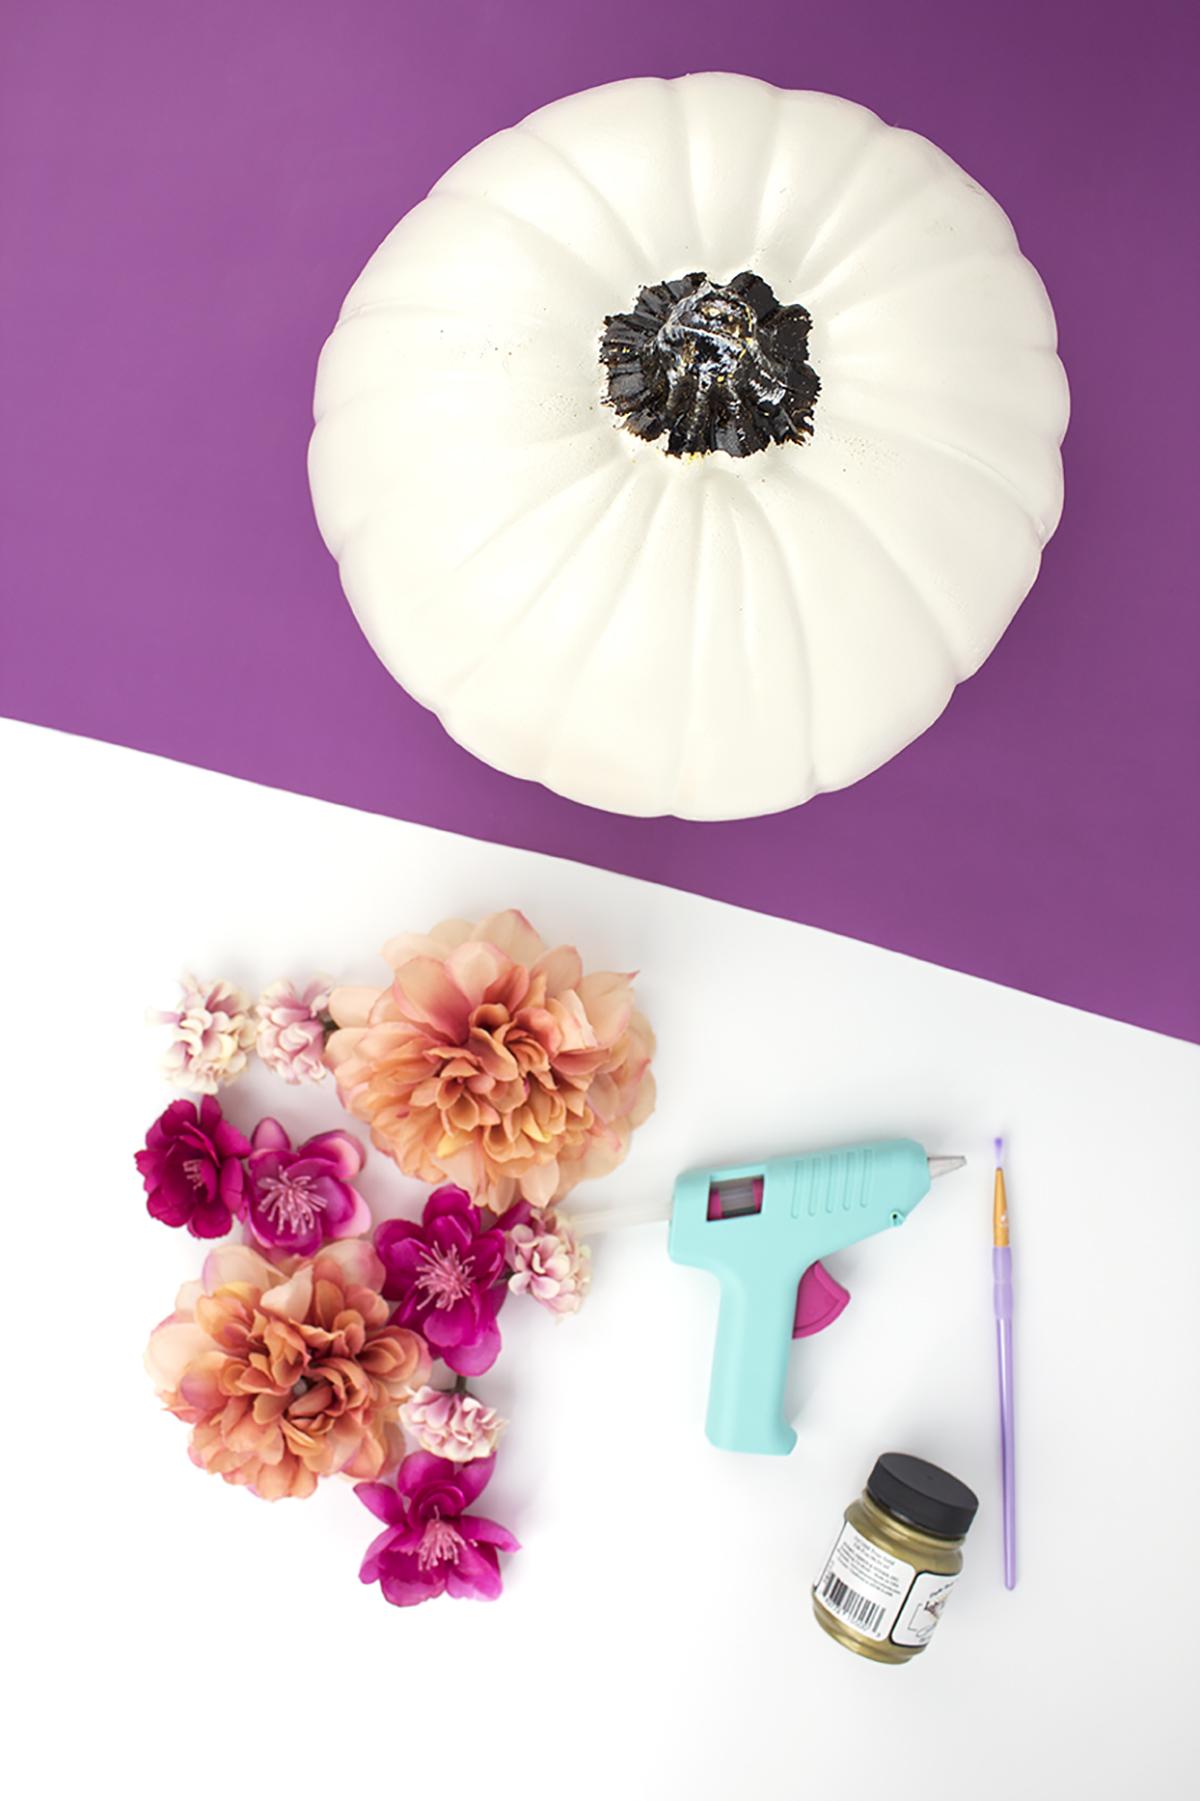 Supplies for DIY Floral Painted Pumpkin